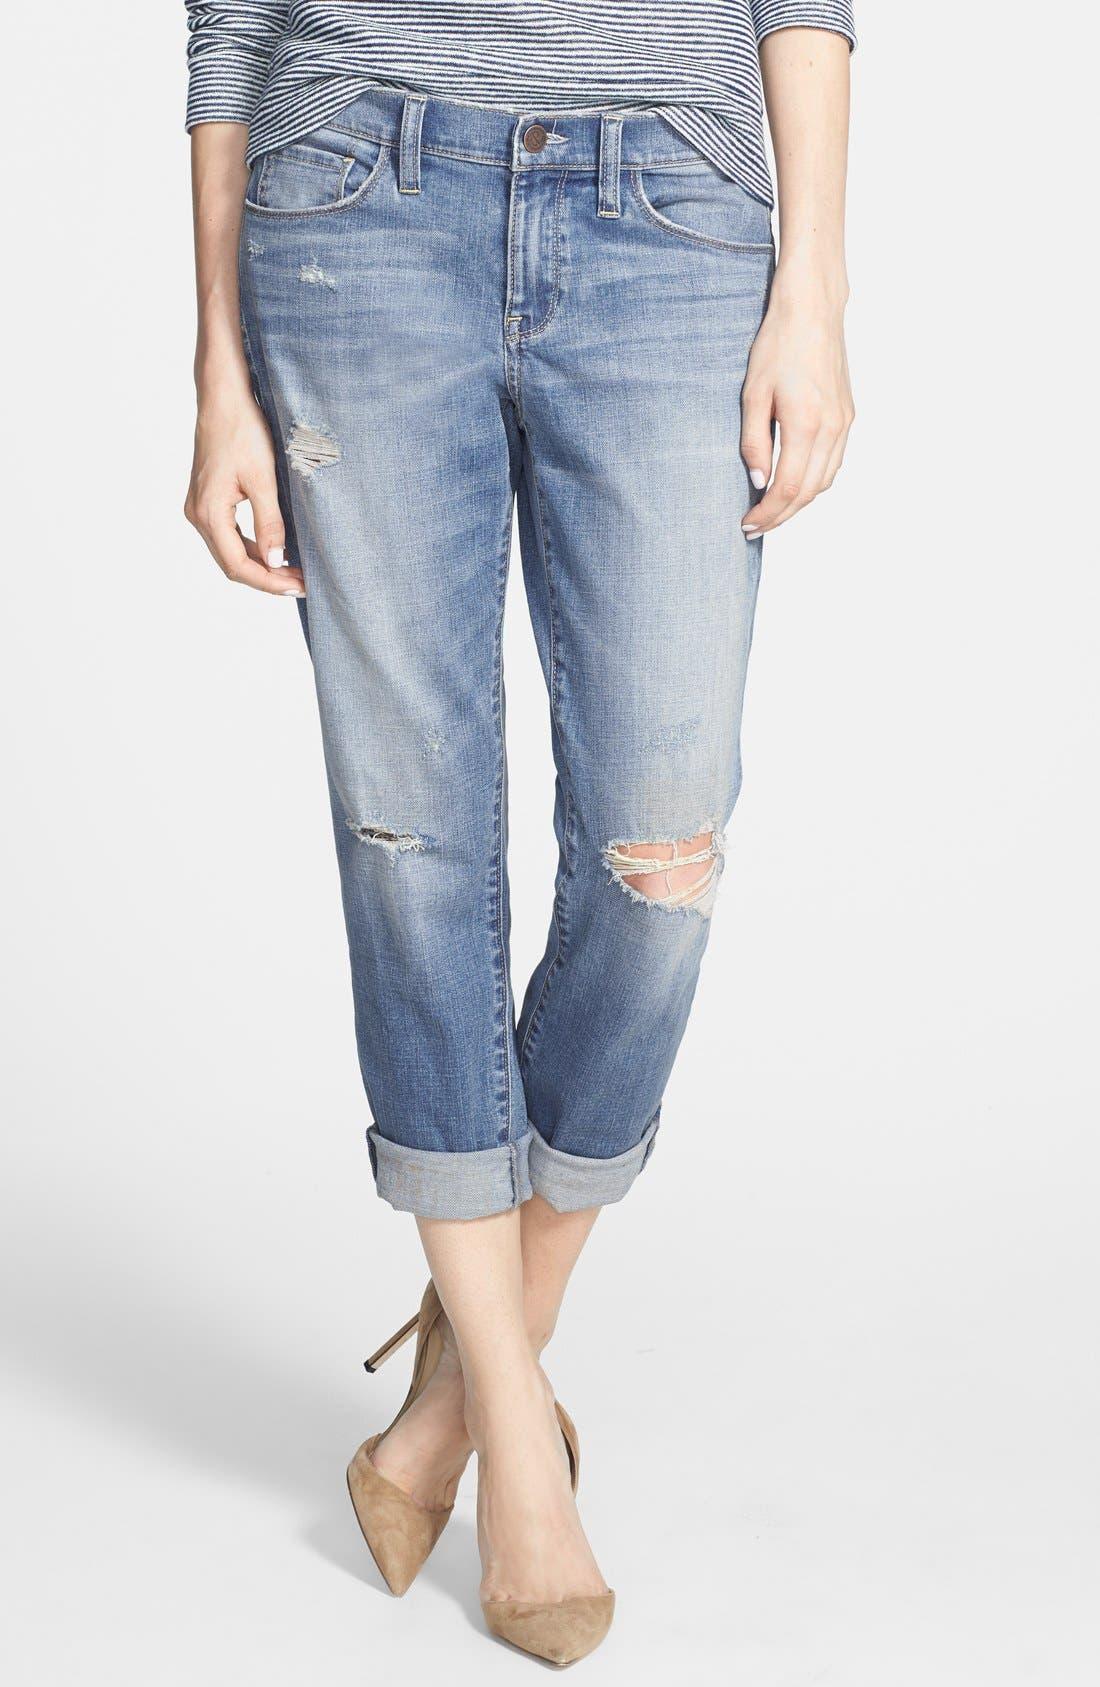 Alternate Image 1 Selected - Treasure&Bond Denim Boyfriend Jeans (Light Vintage Wash)